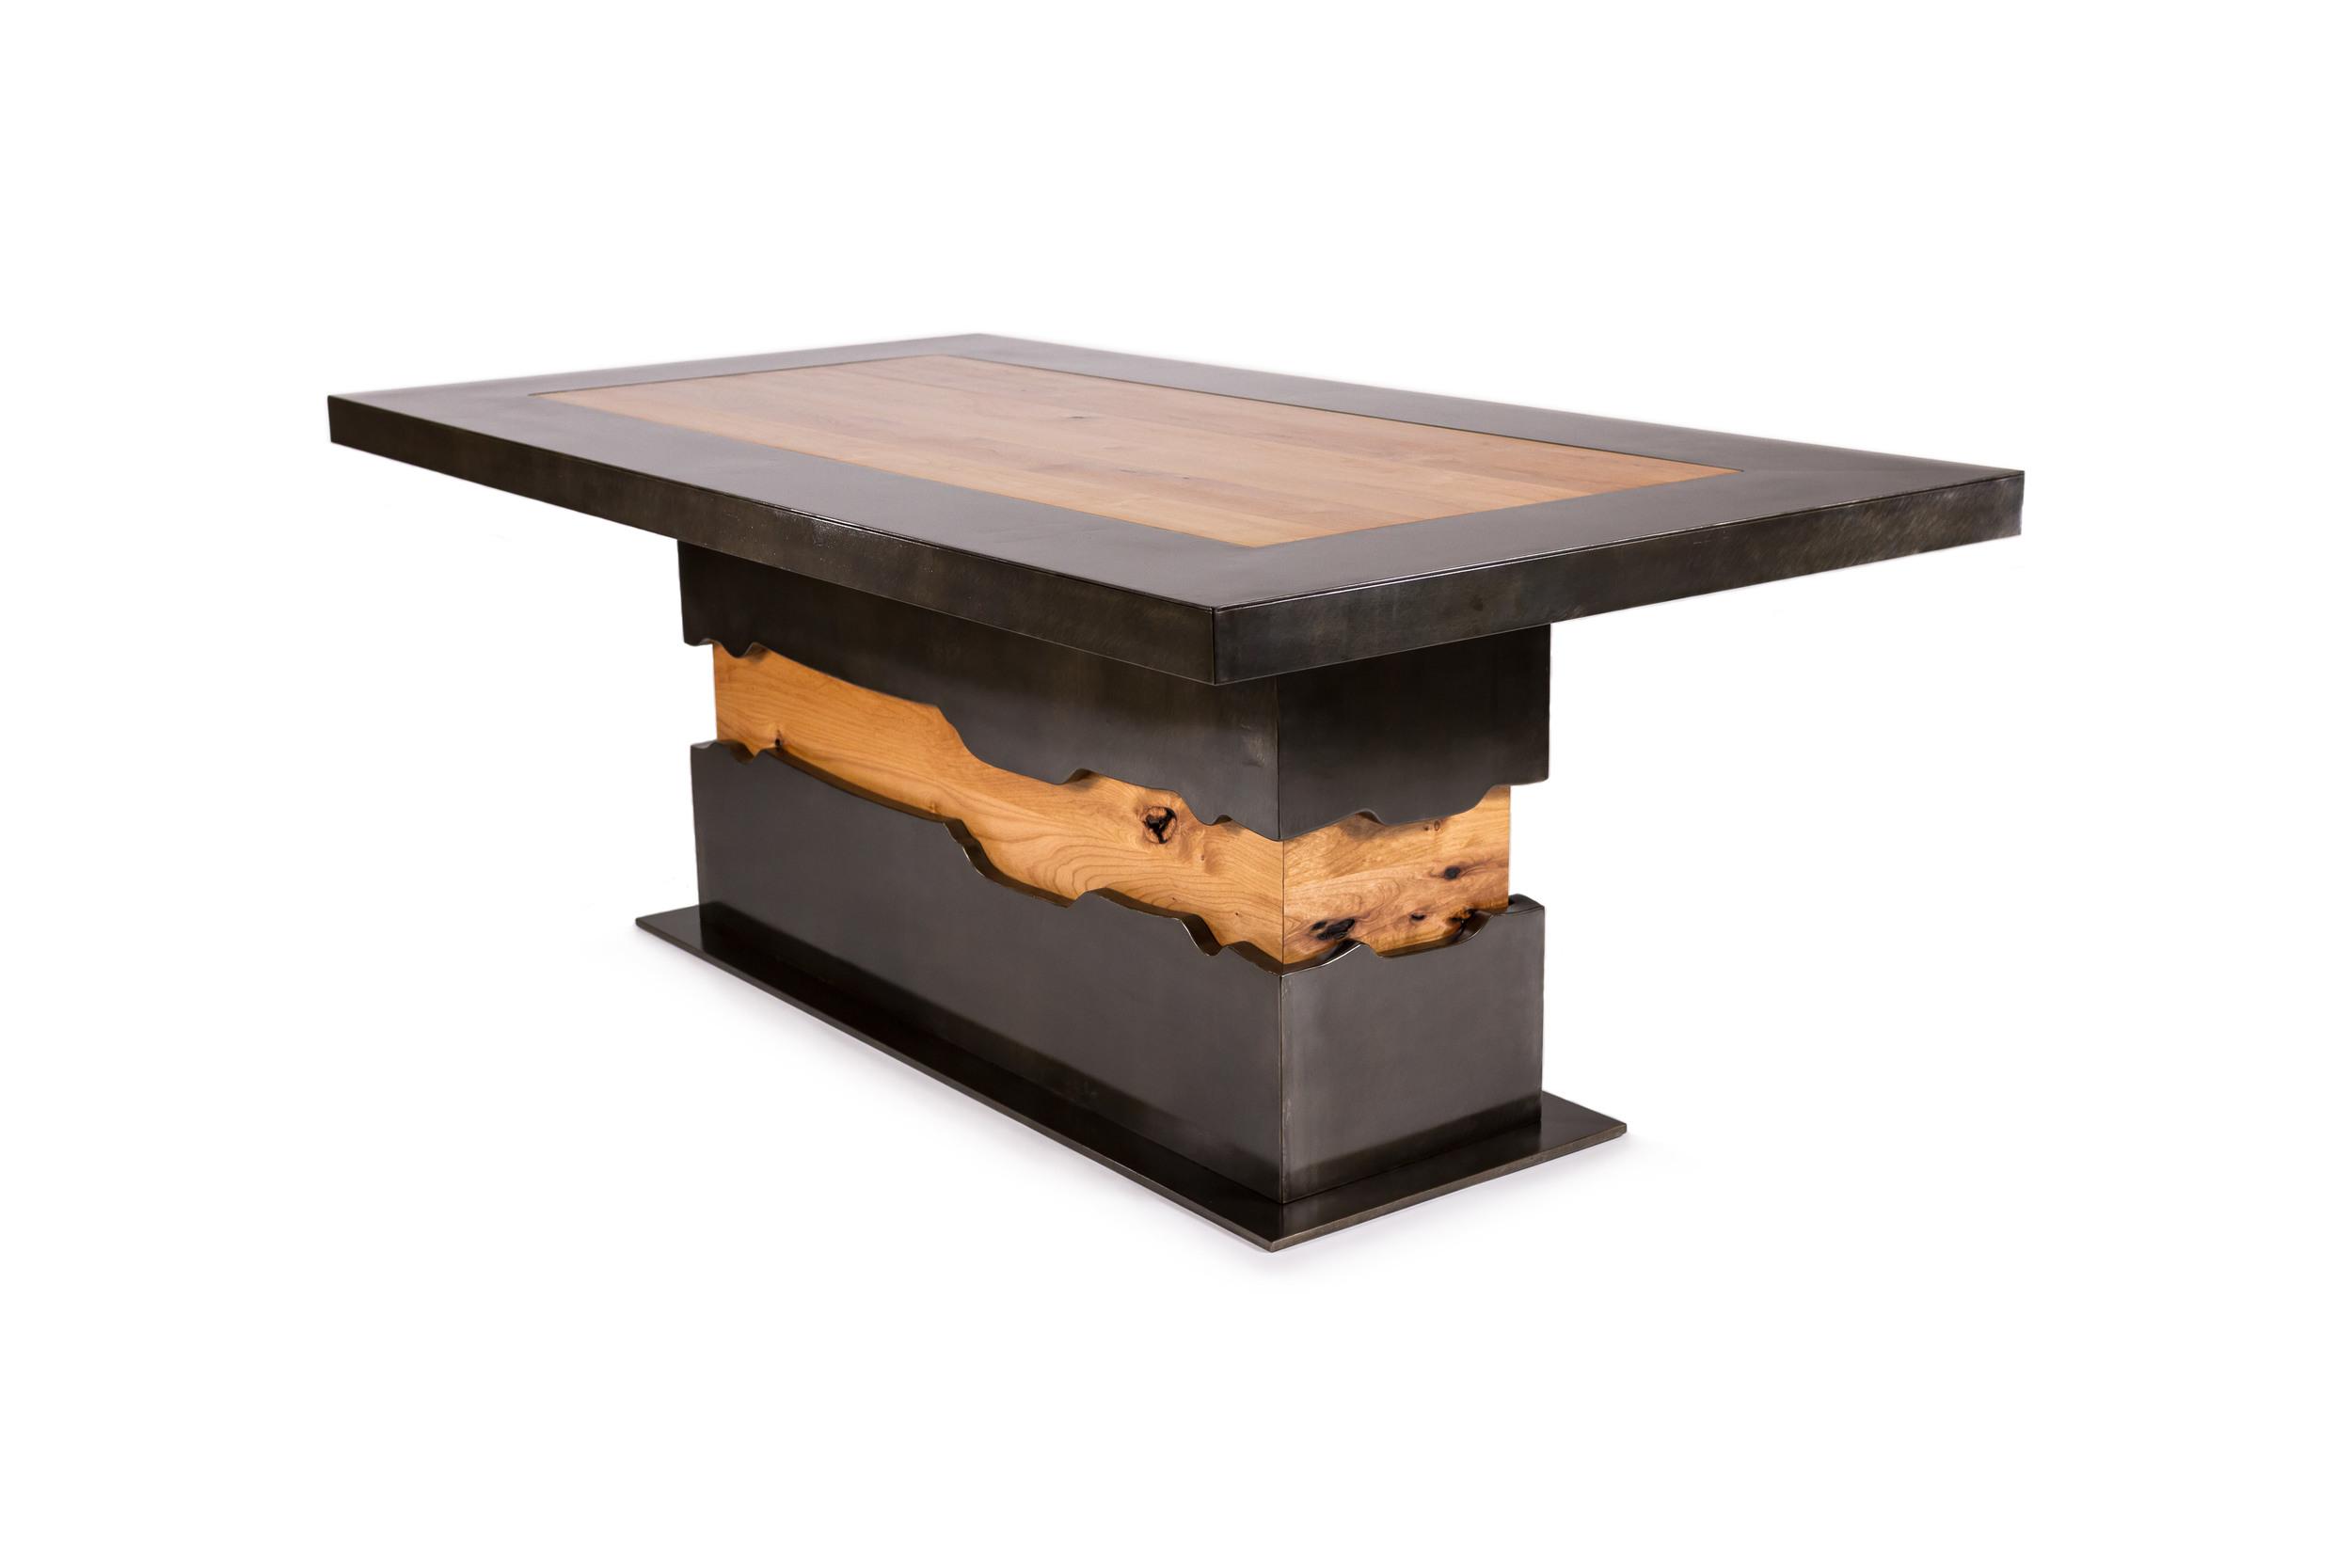 Dining Room Table 3 -Edit.jpg